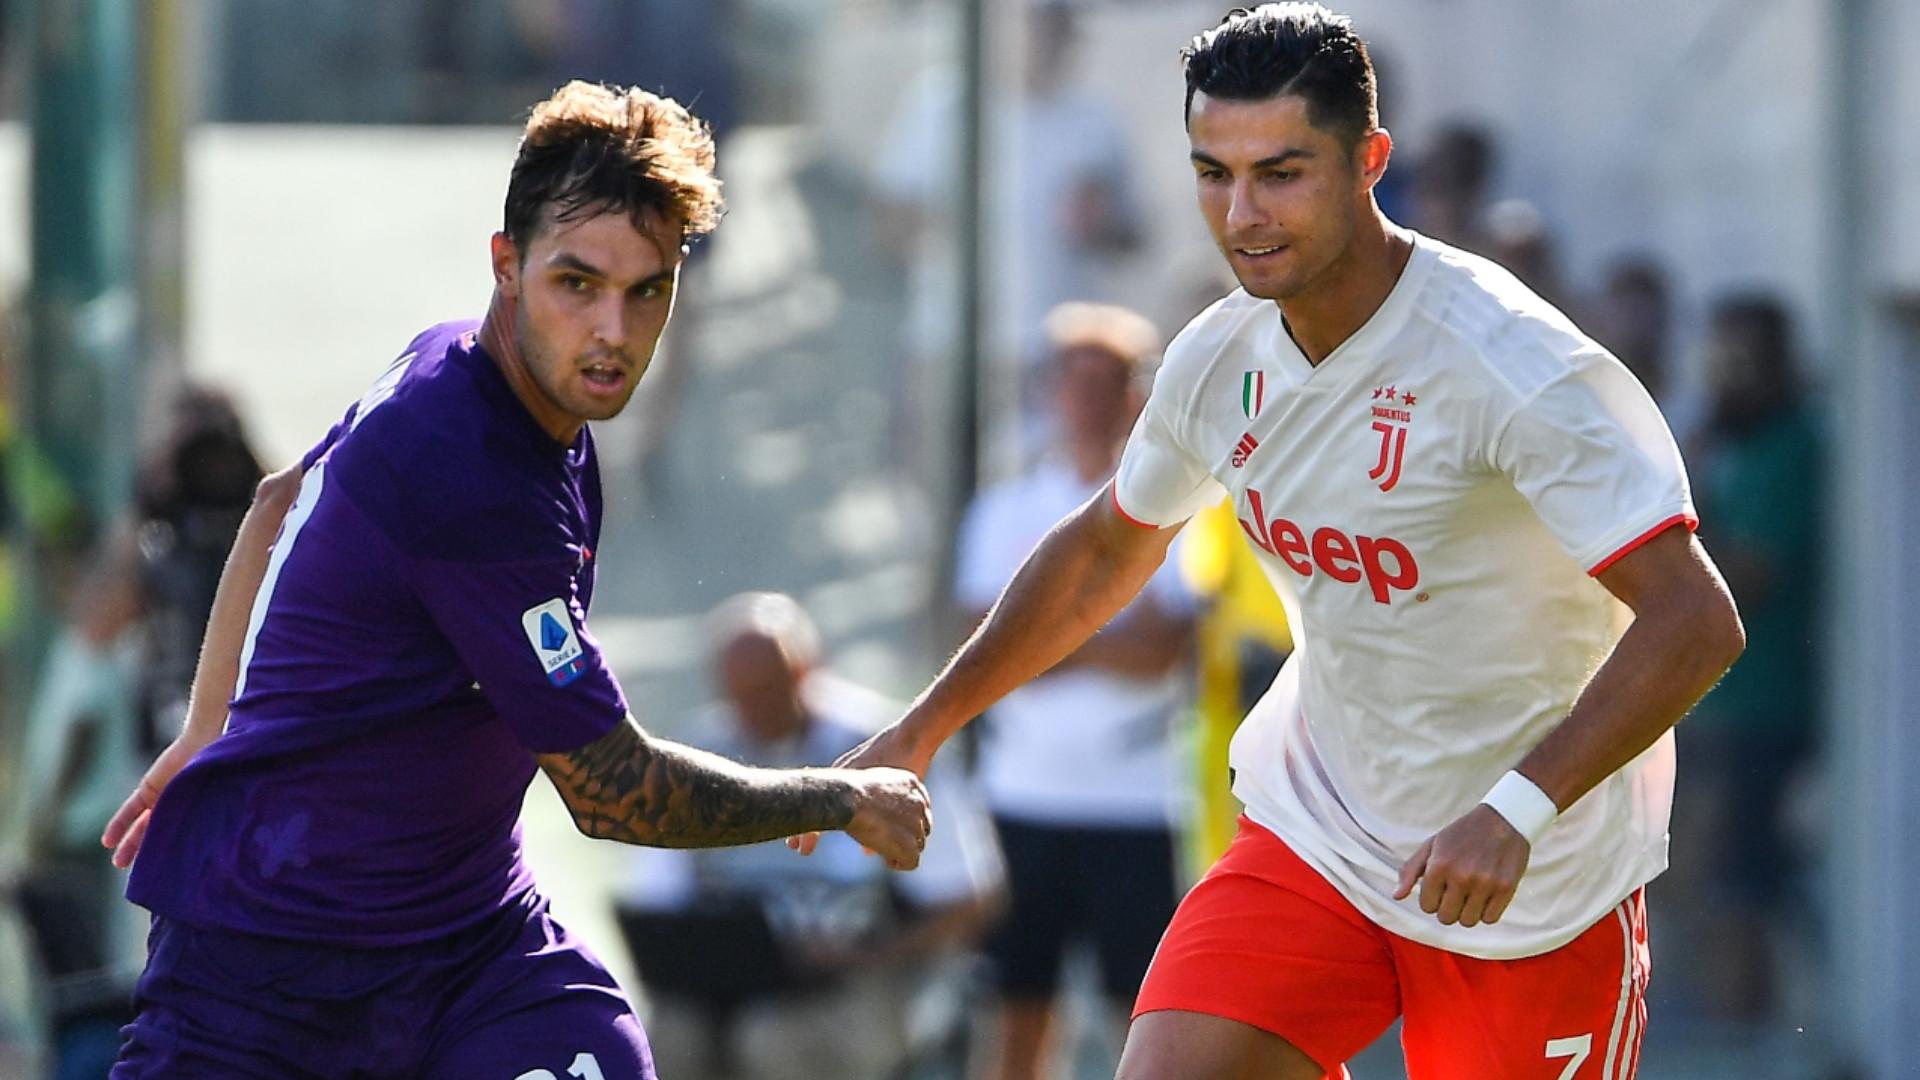 Fiorentina-Juventus (0-0), Ribéry et la Viola résistent à la Juventus